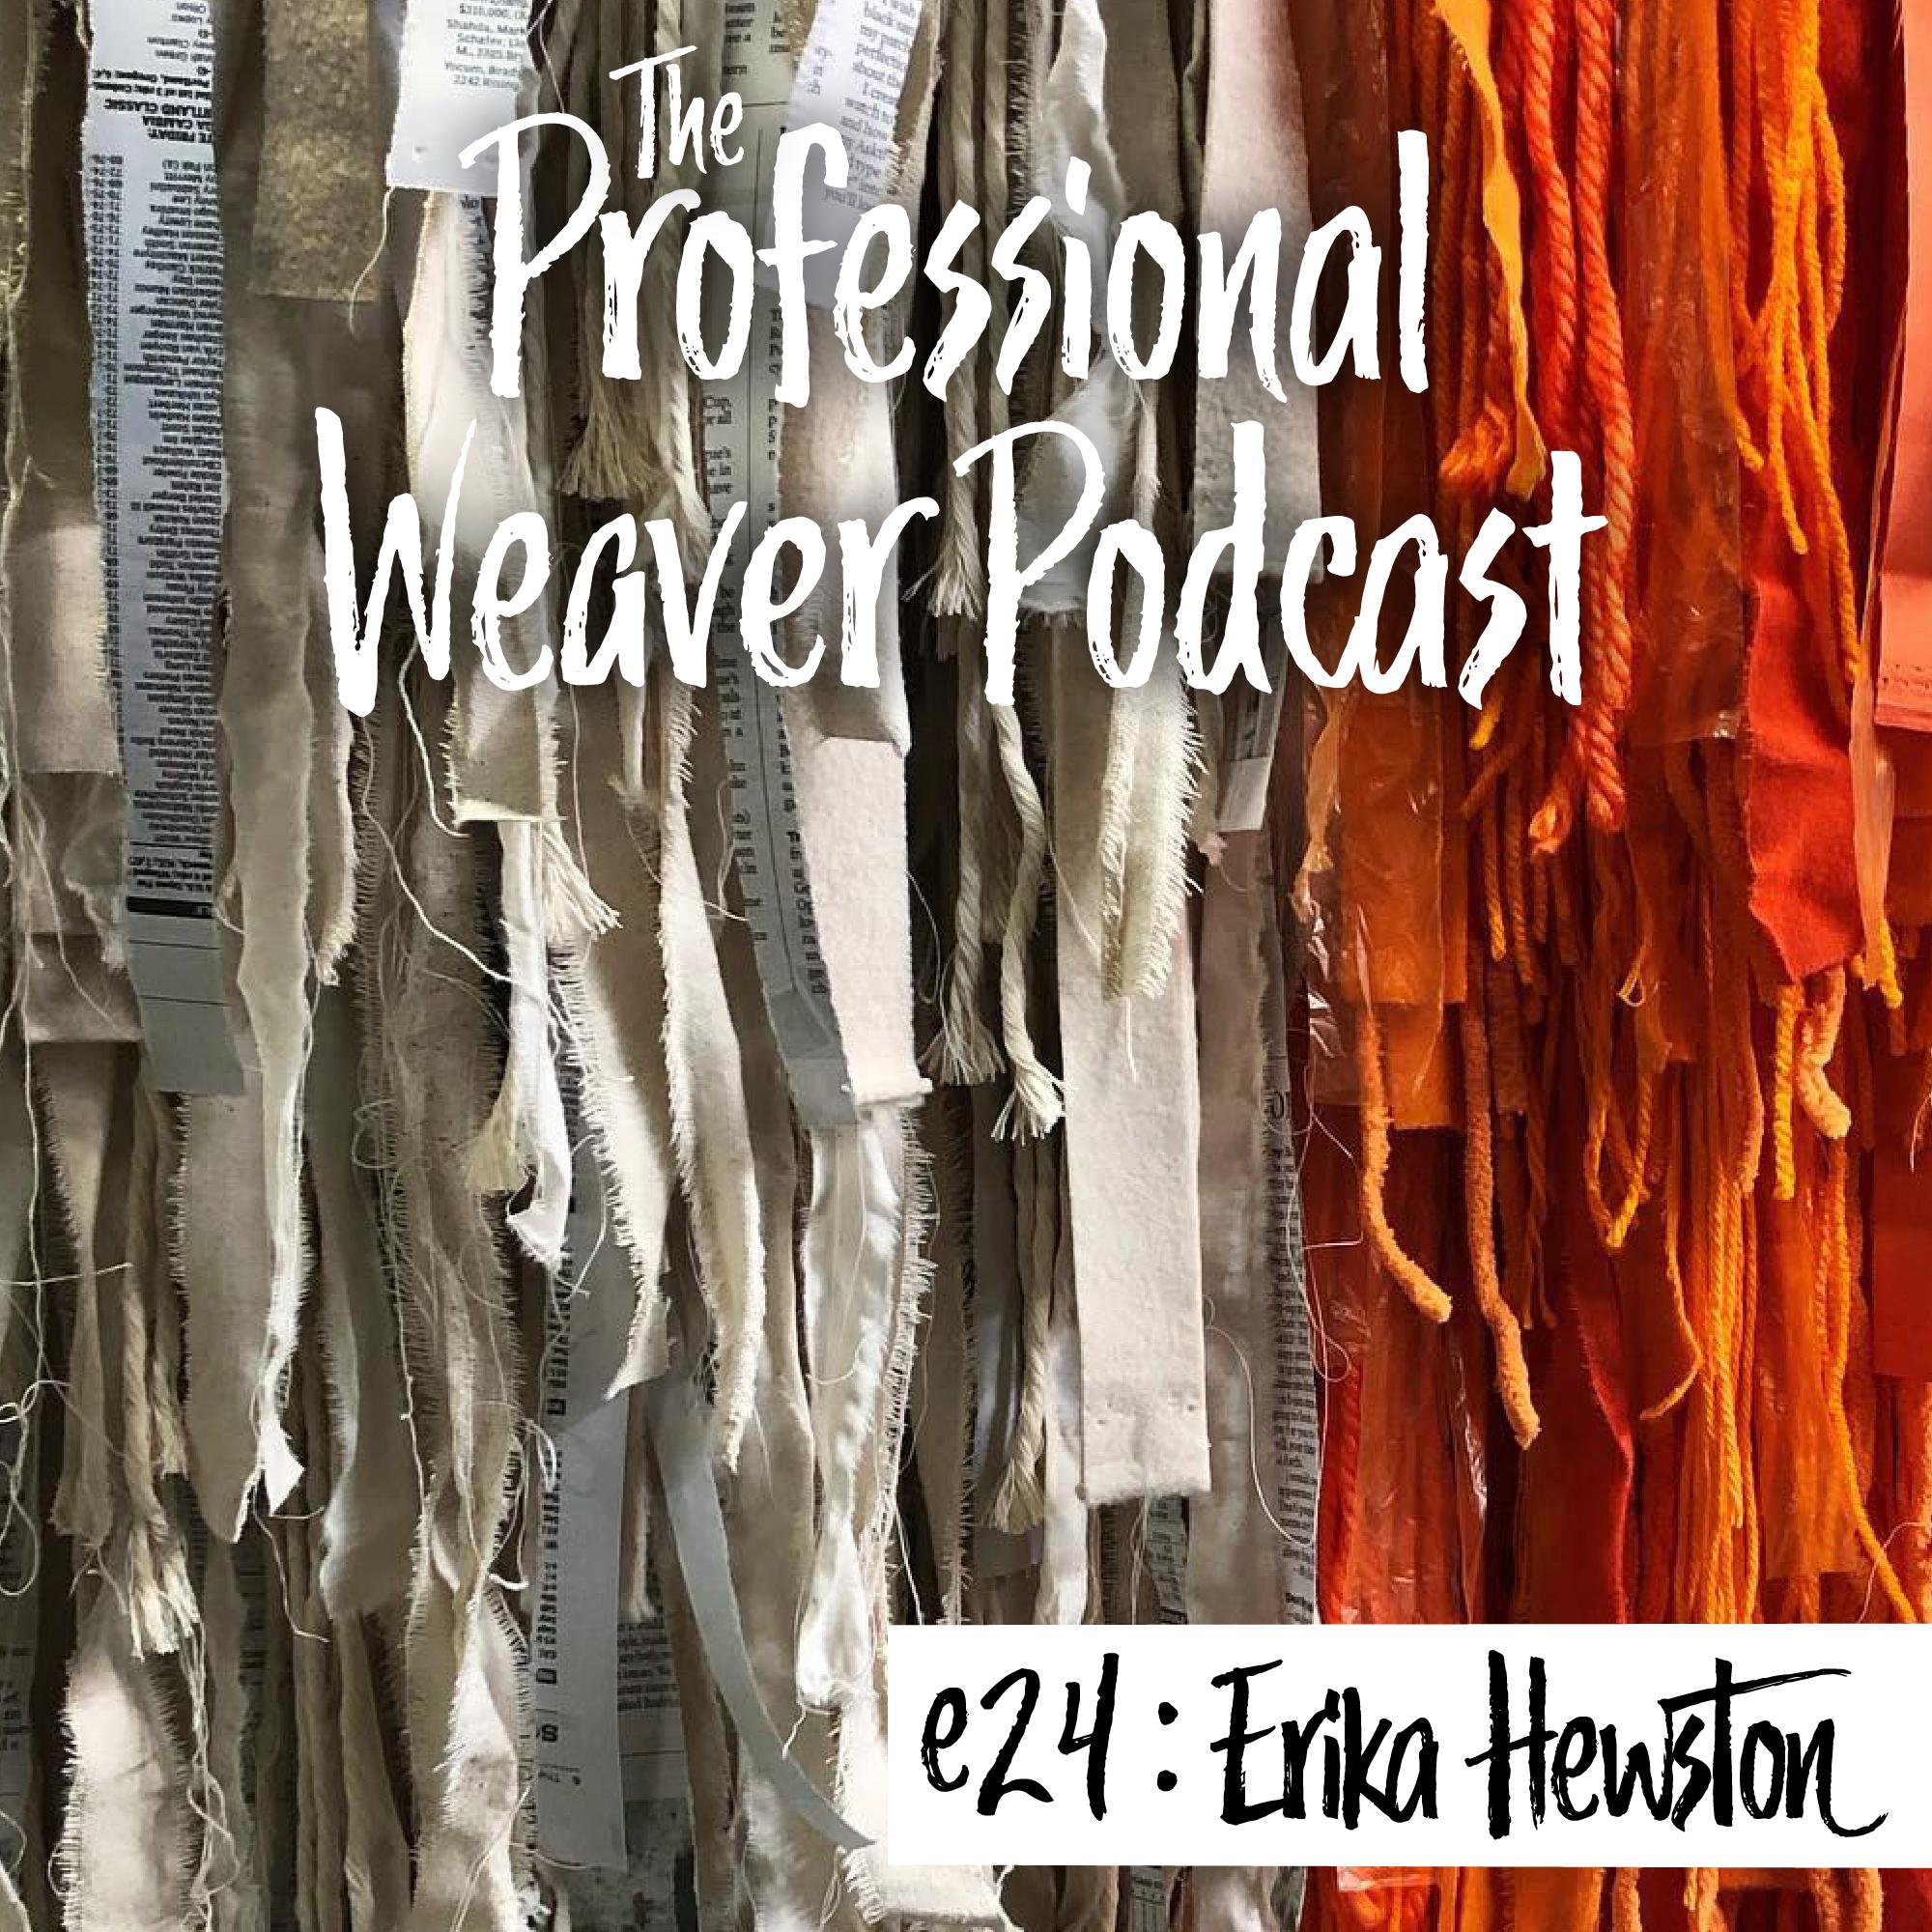 Episode 24 : Erika Hewston